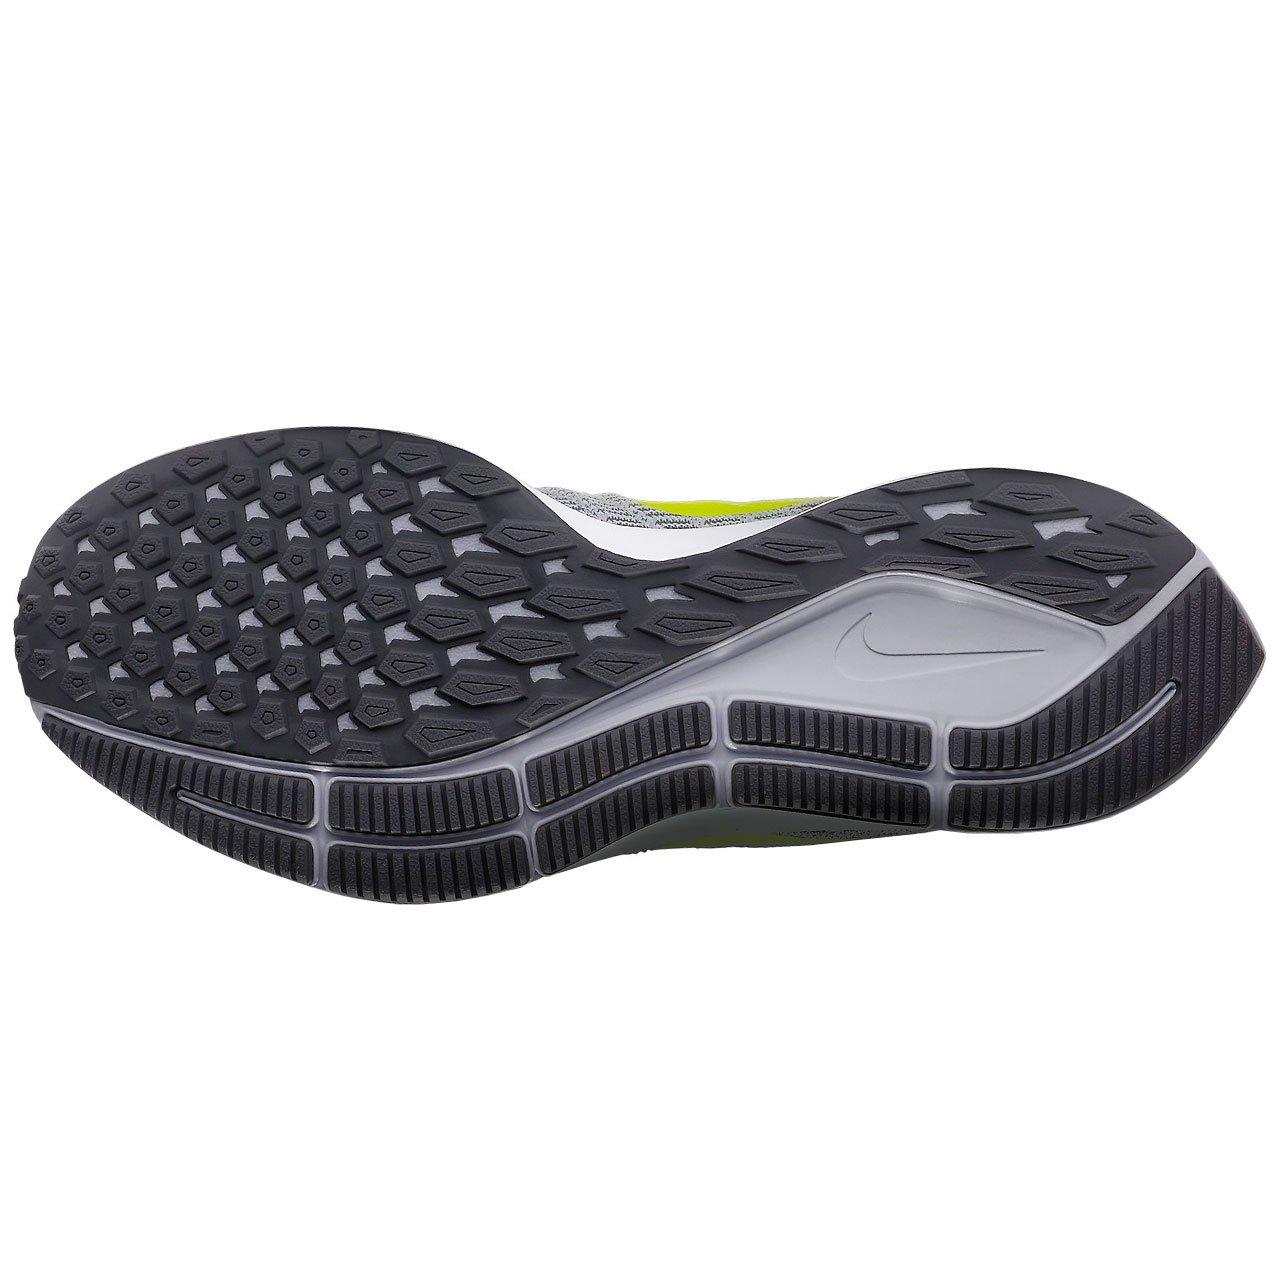 Nike Womens Air Zoom Pegasus 35 Running Shoes B079ZN9T11 7.5 B(M) US|White/Volt-gunsmoke-atmosphere Grey